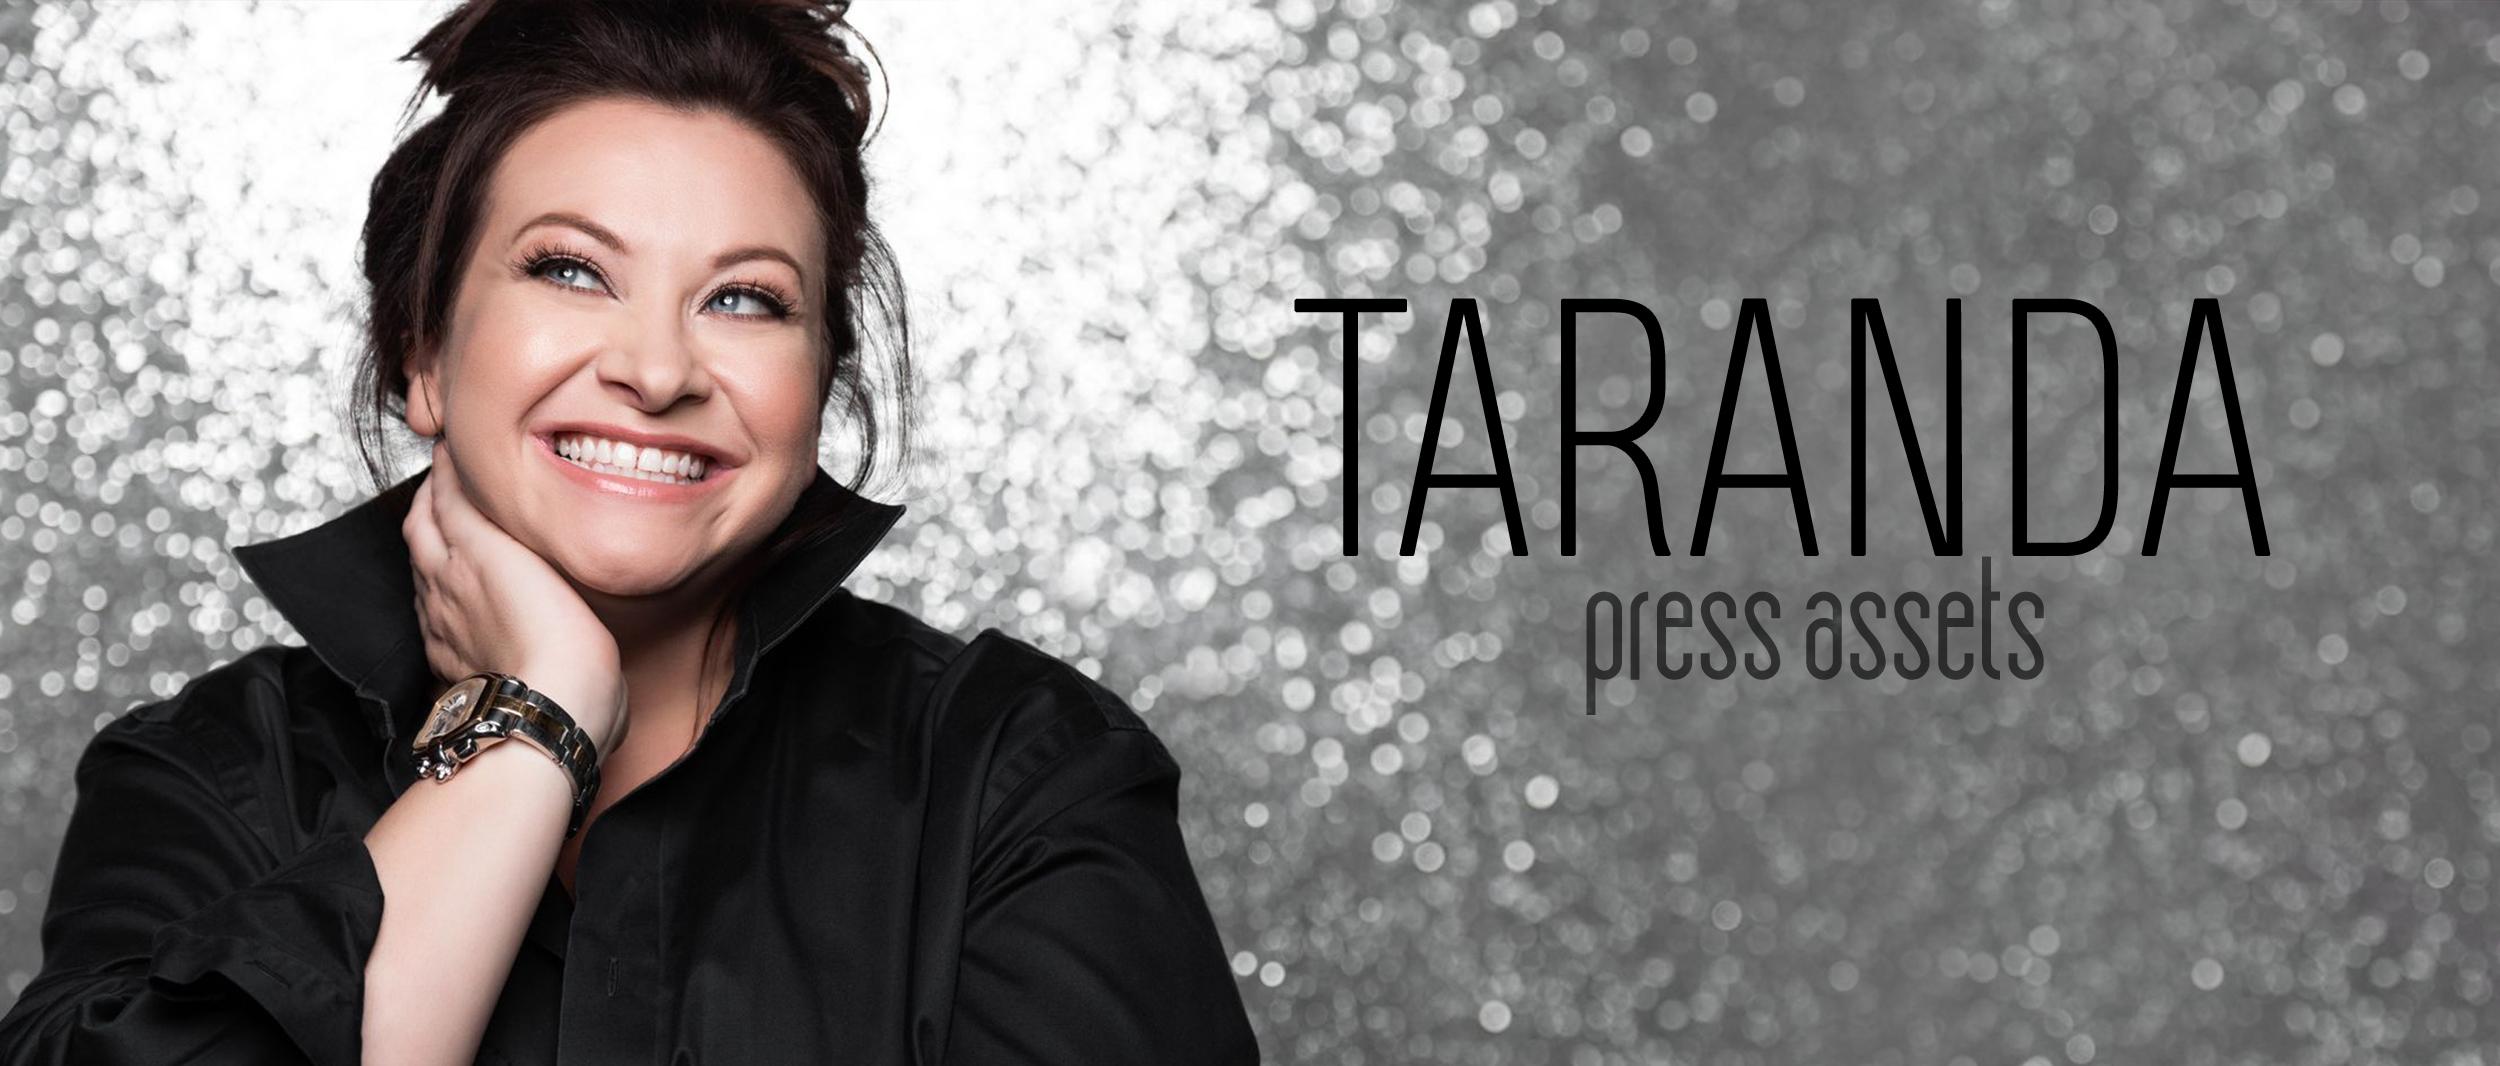 TaRanda-press-assets.jpg